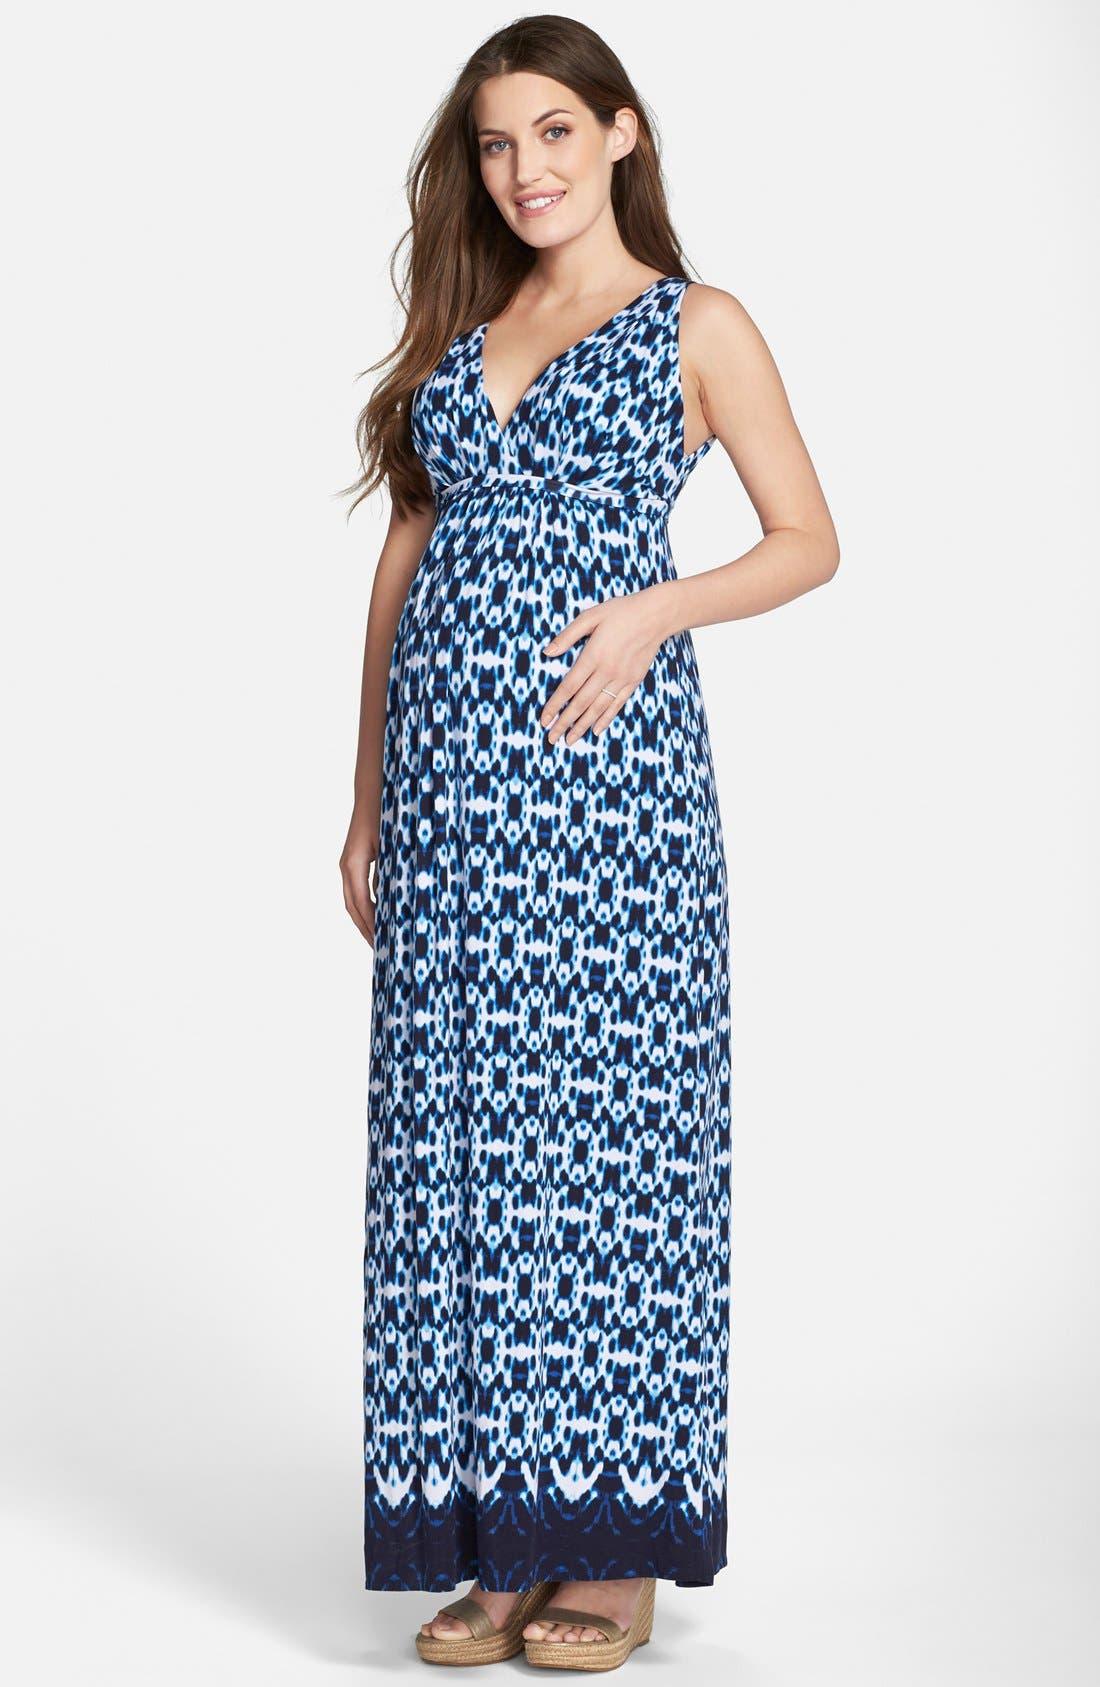 'Chloe' Maternity Maxi Dress,                             Main thumbnail 1, color,                             Circle Tie Dye